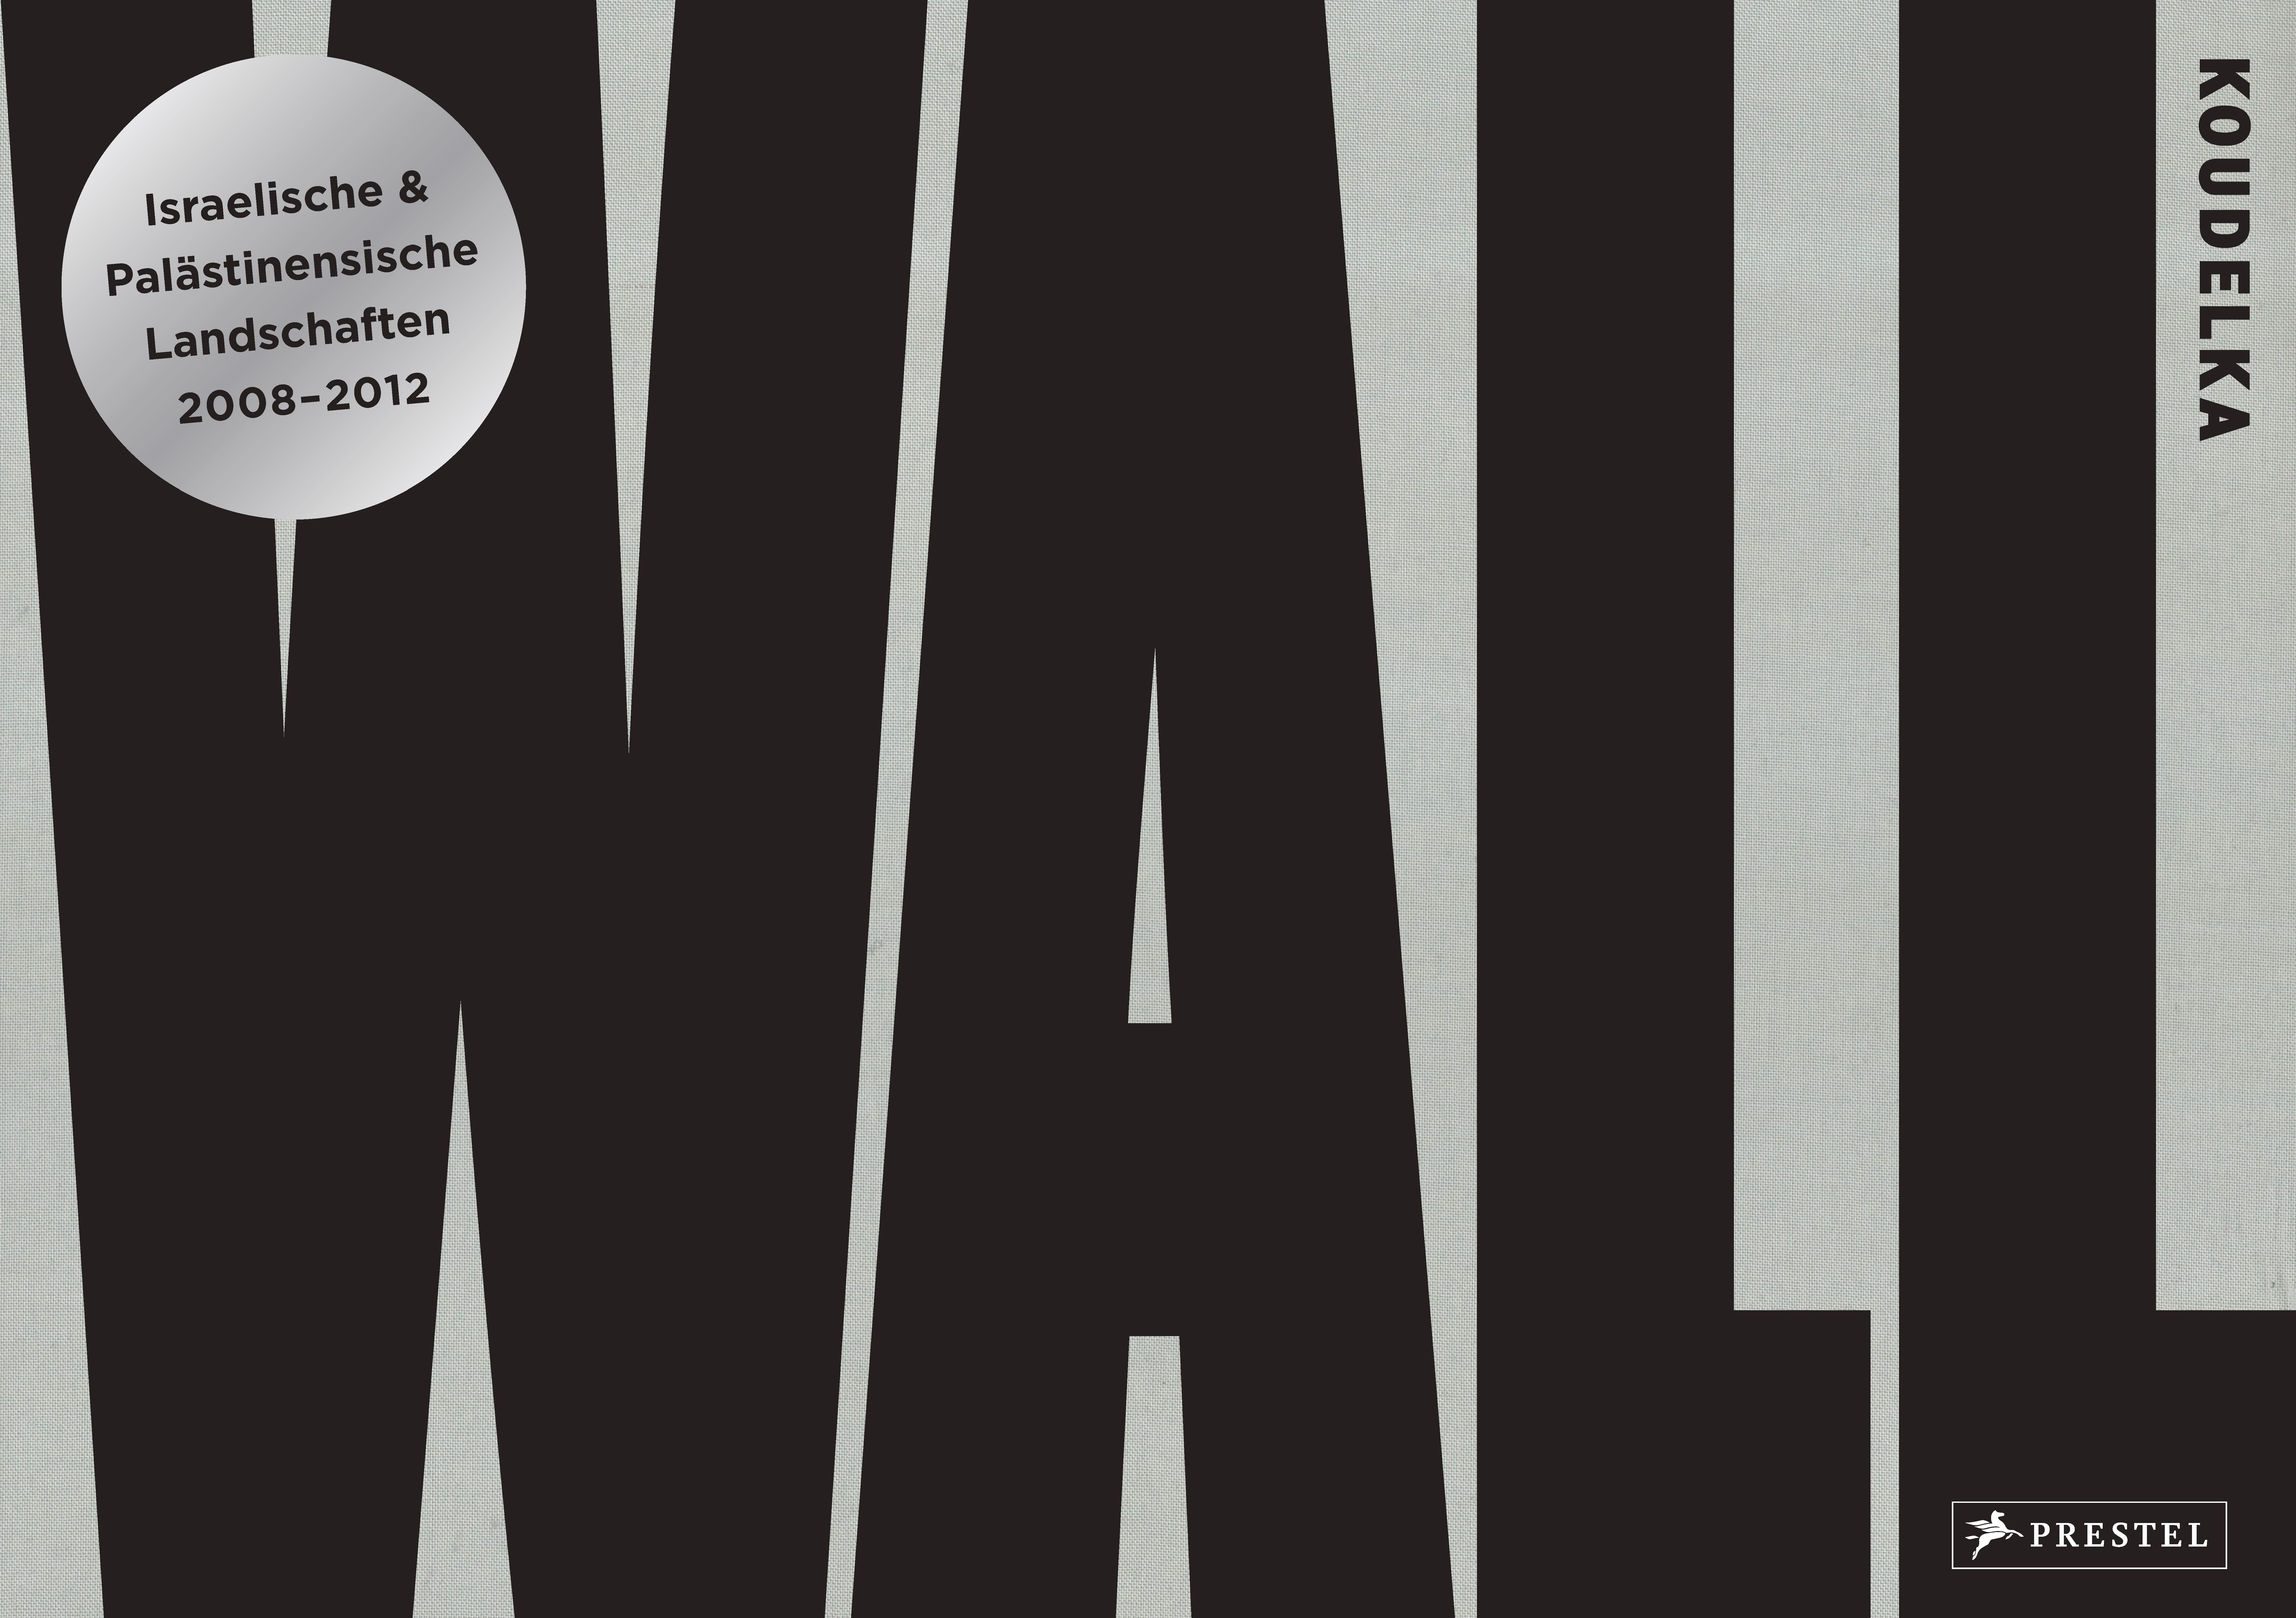 Josef Koudelka: Wall  Israelische & Palästinensische Landschaften - 2008-20 ...